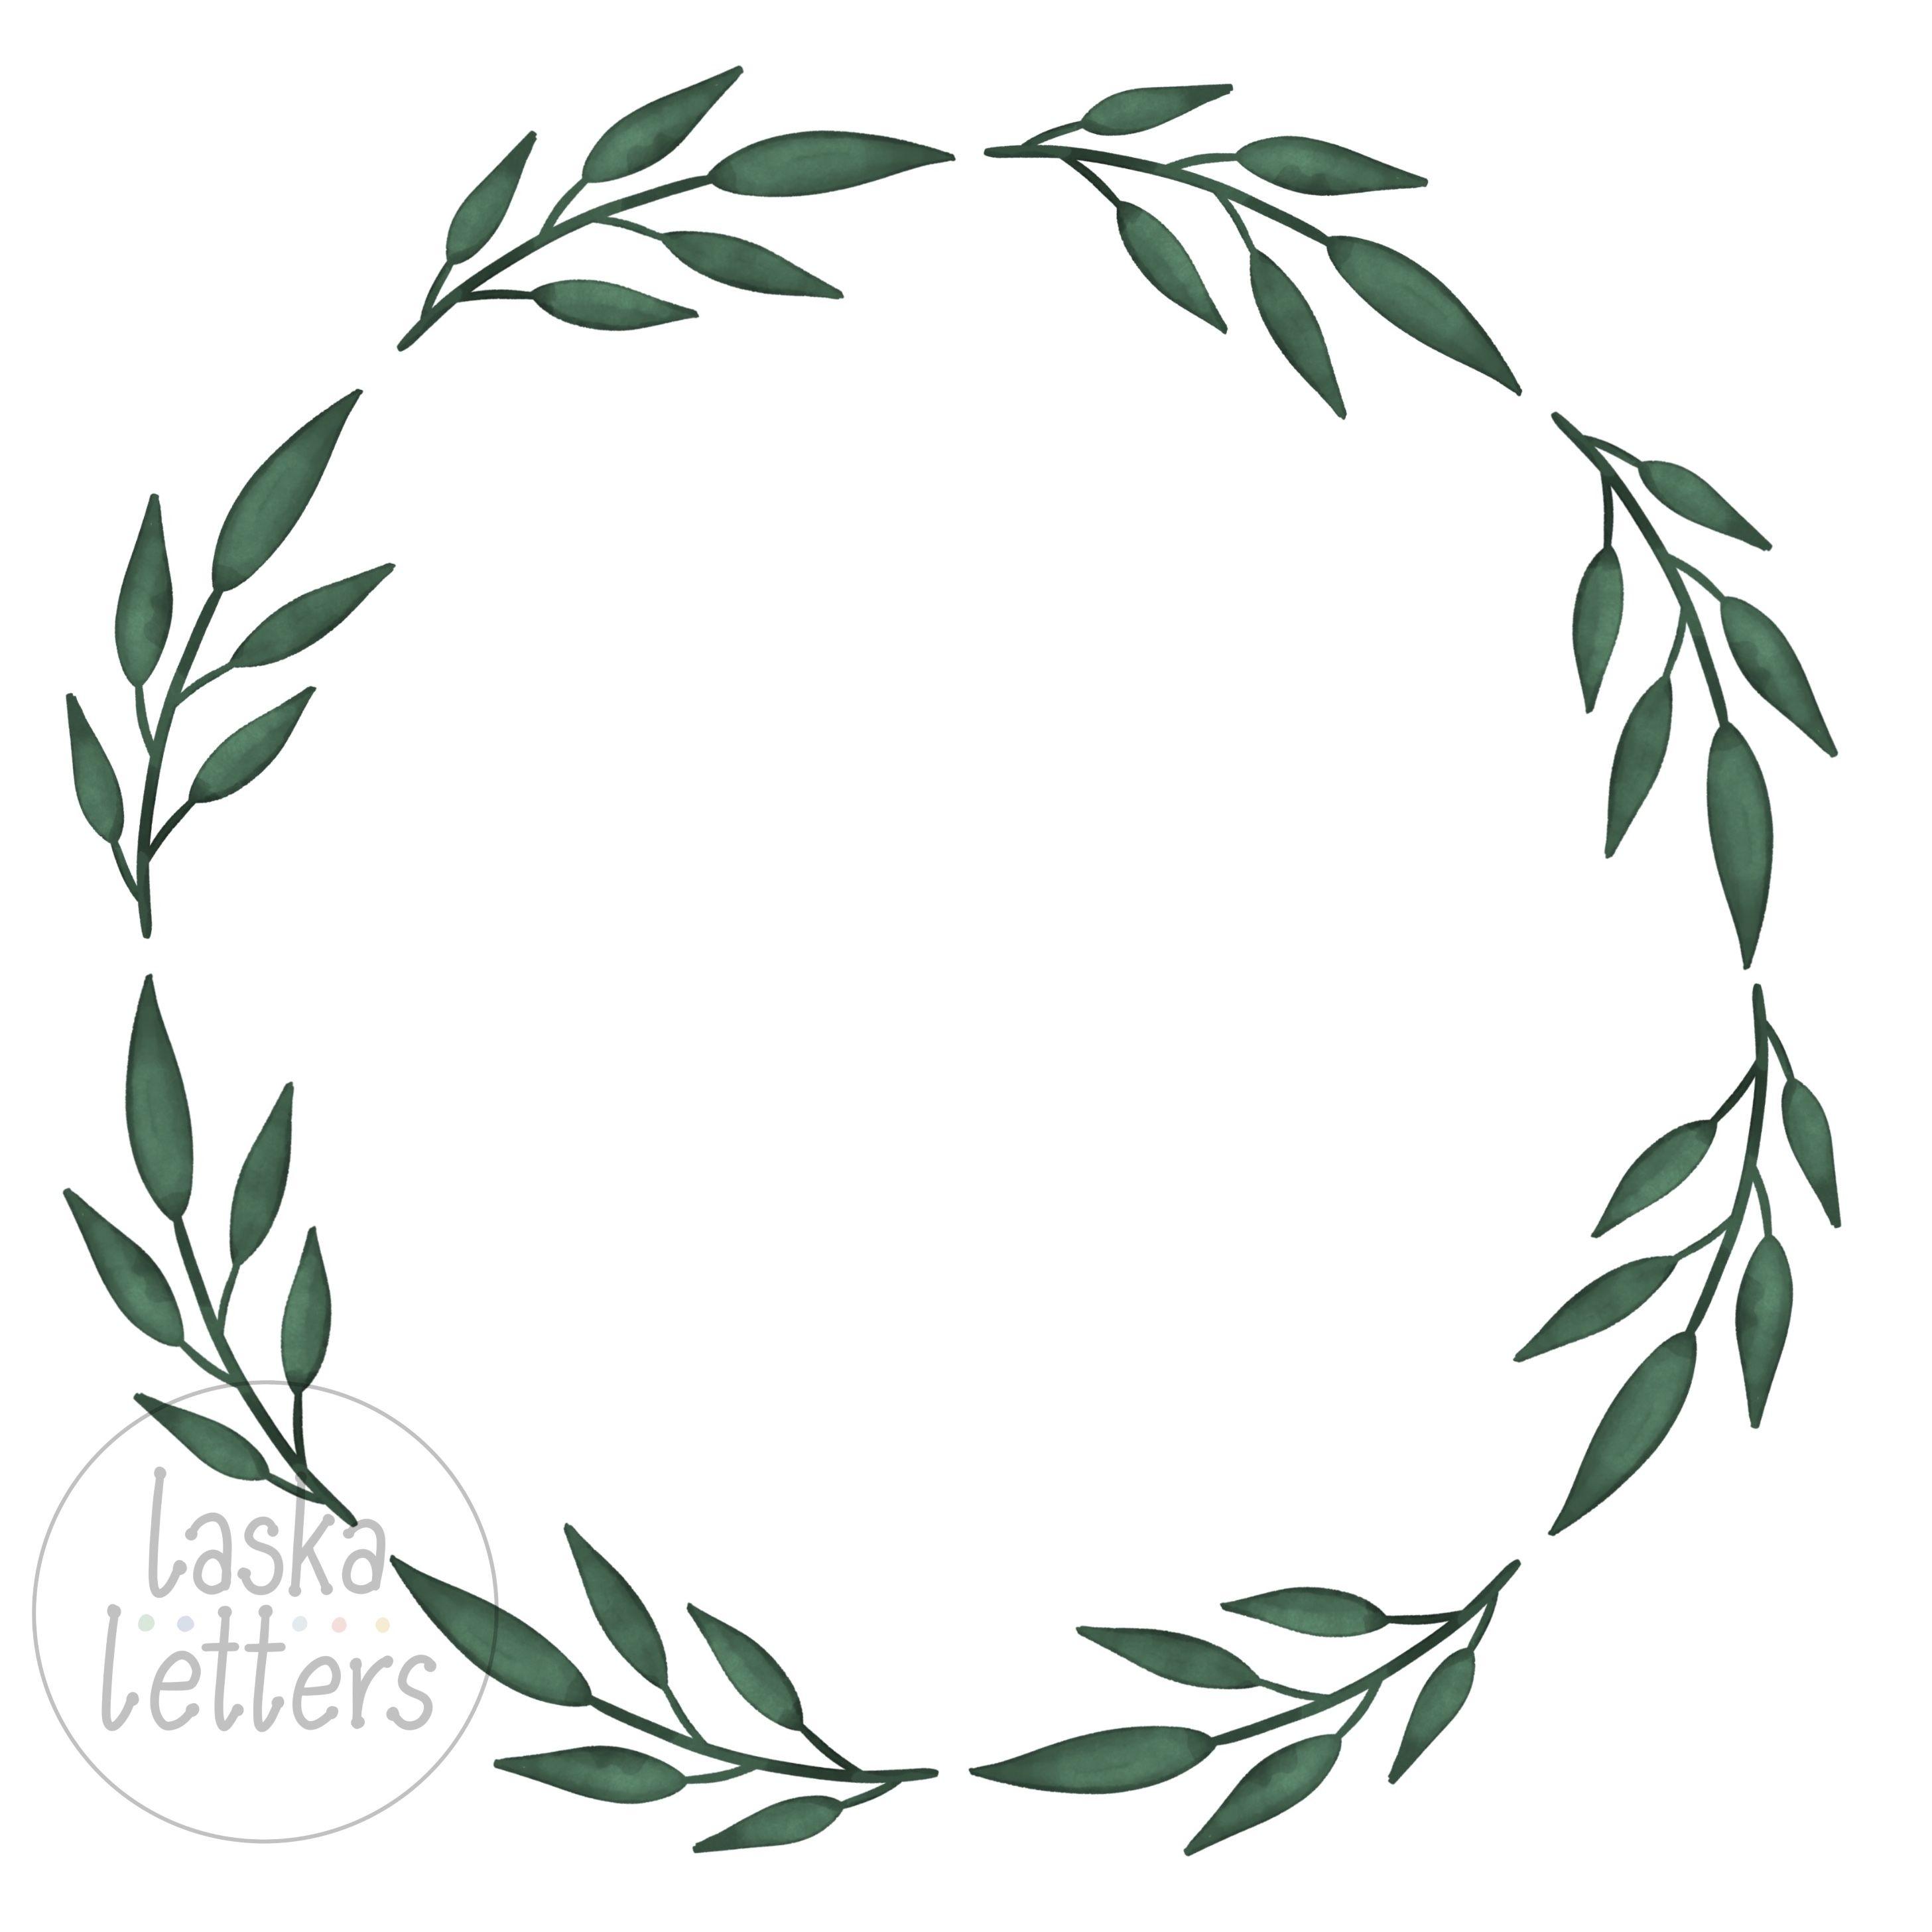 Green Watercolor Wreath Clipart Watercolor Wreath Png Jpeg Etsy Wreath Watercolor Pink Flowers Wallpaper Green Watercolor